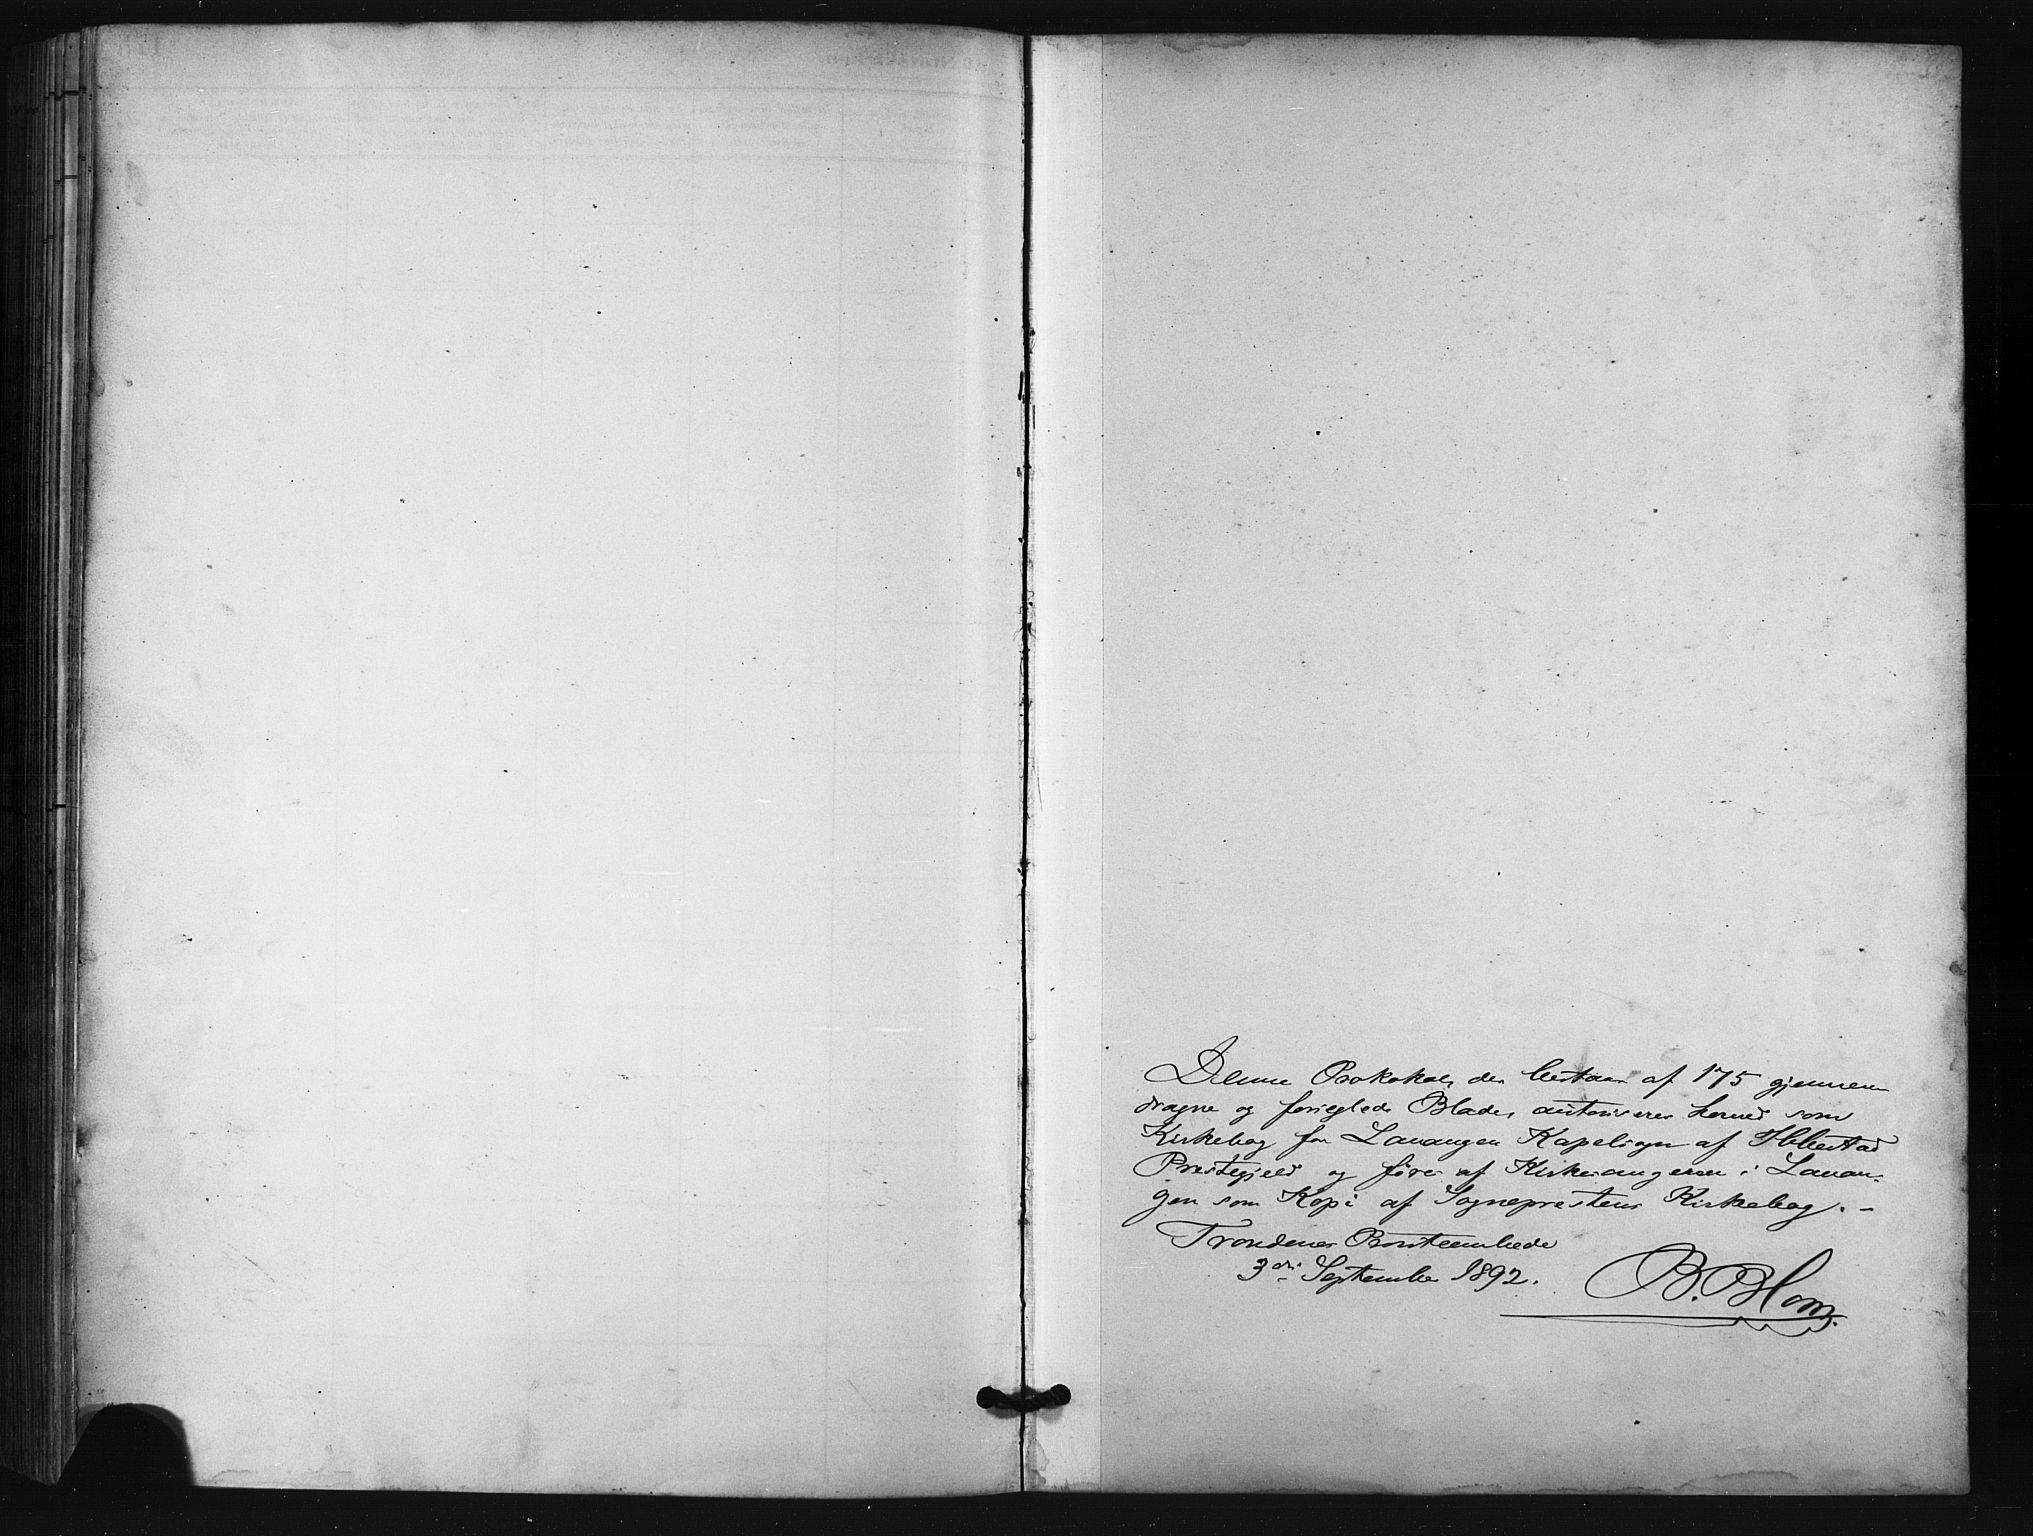 SATØ, Salangen sokneprestembete, H/Ha/L0001klokker: Klokkerbok nr. 1, 1893-1910